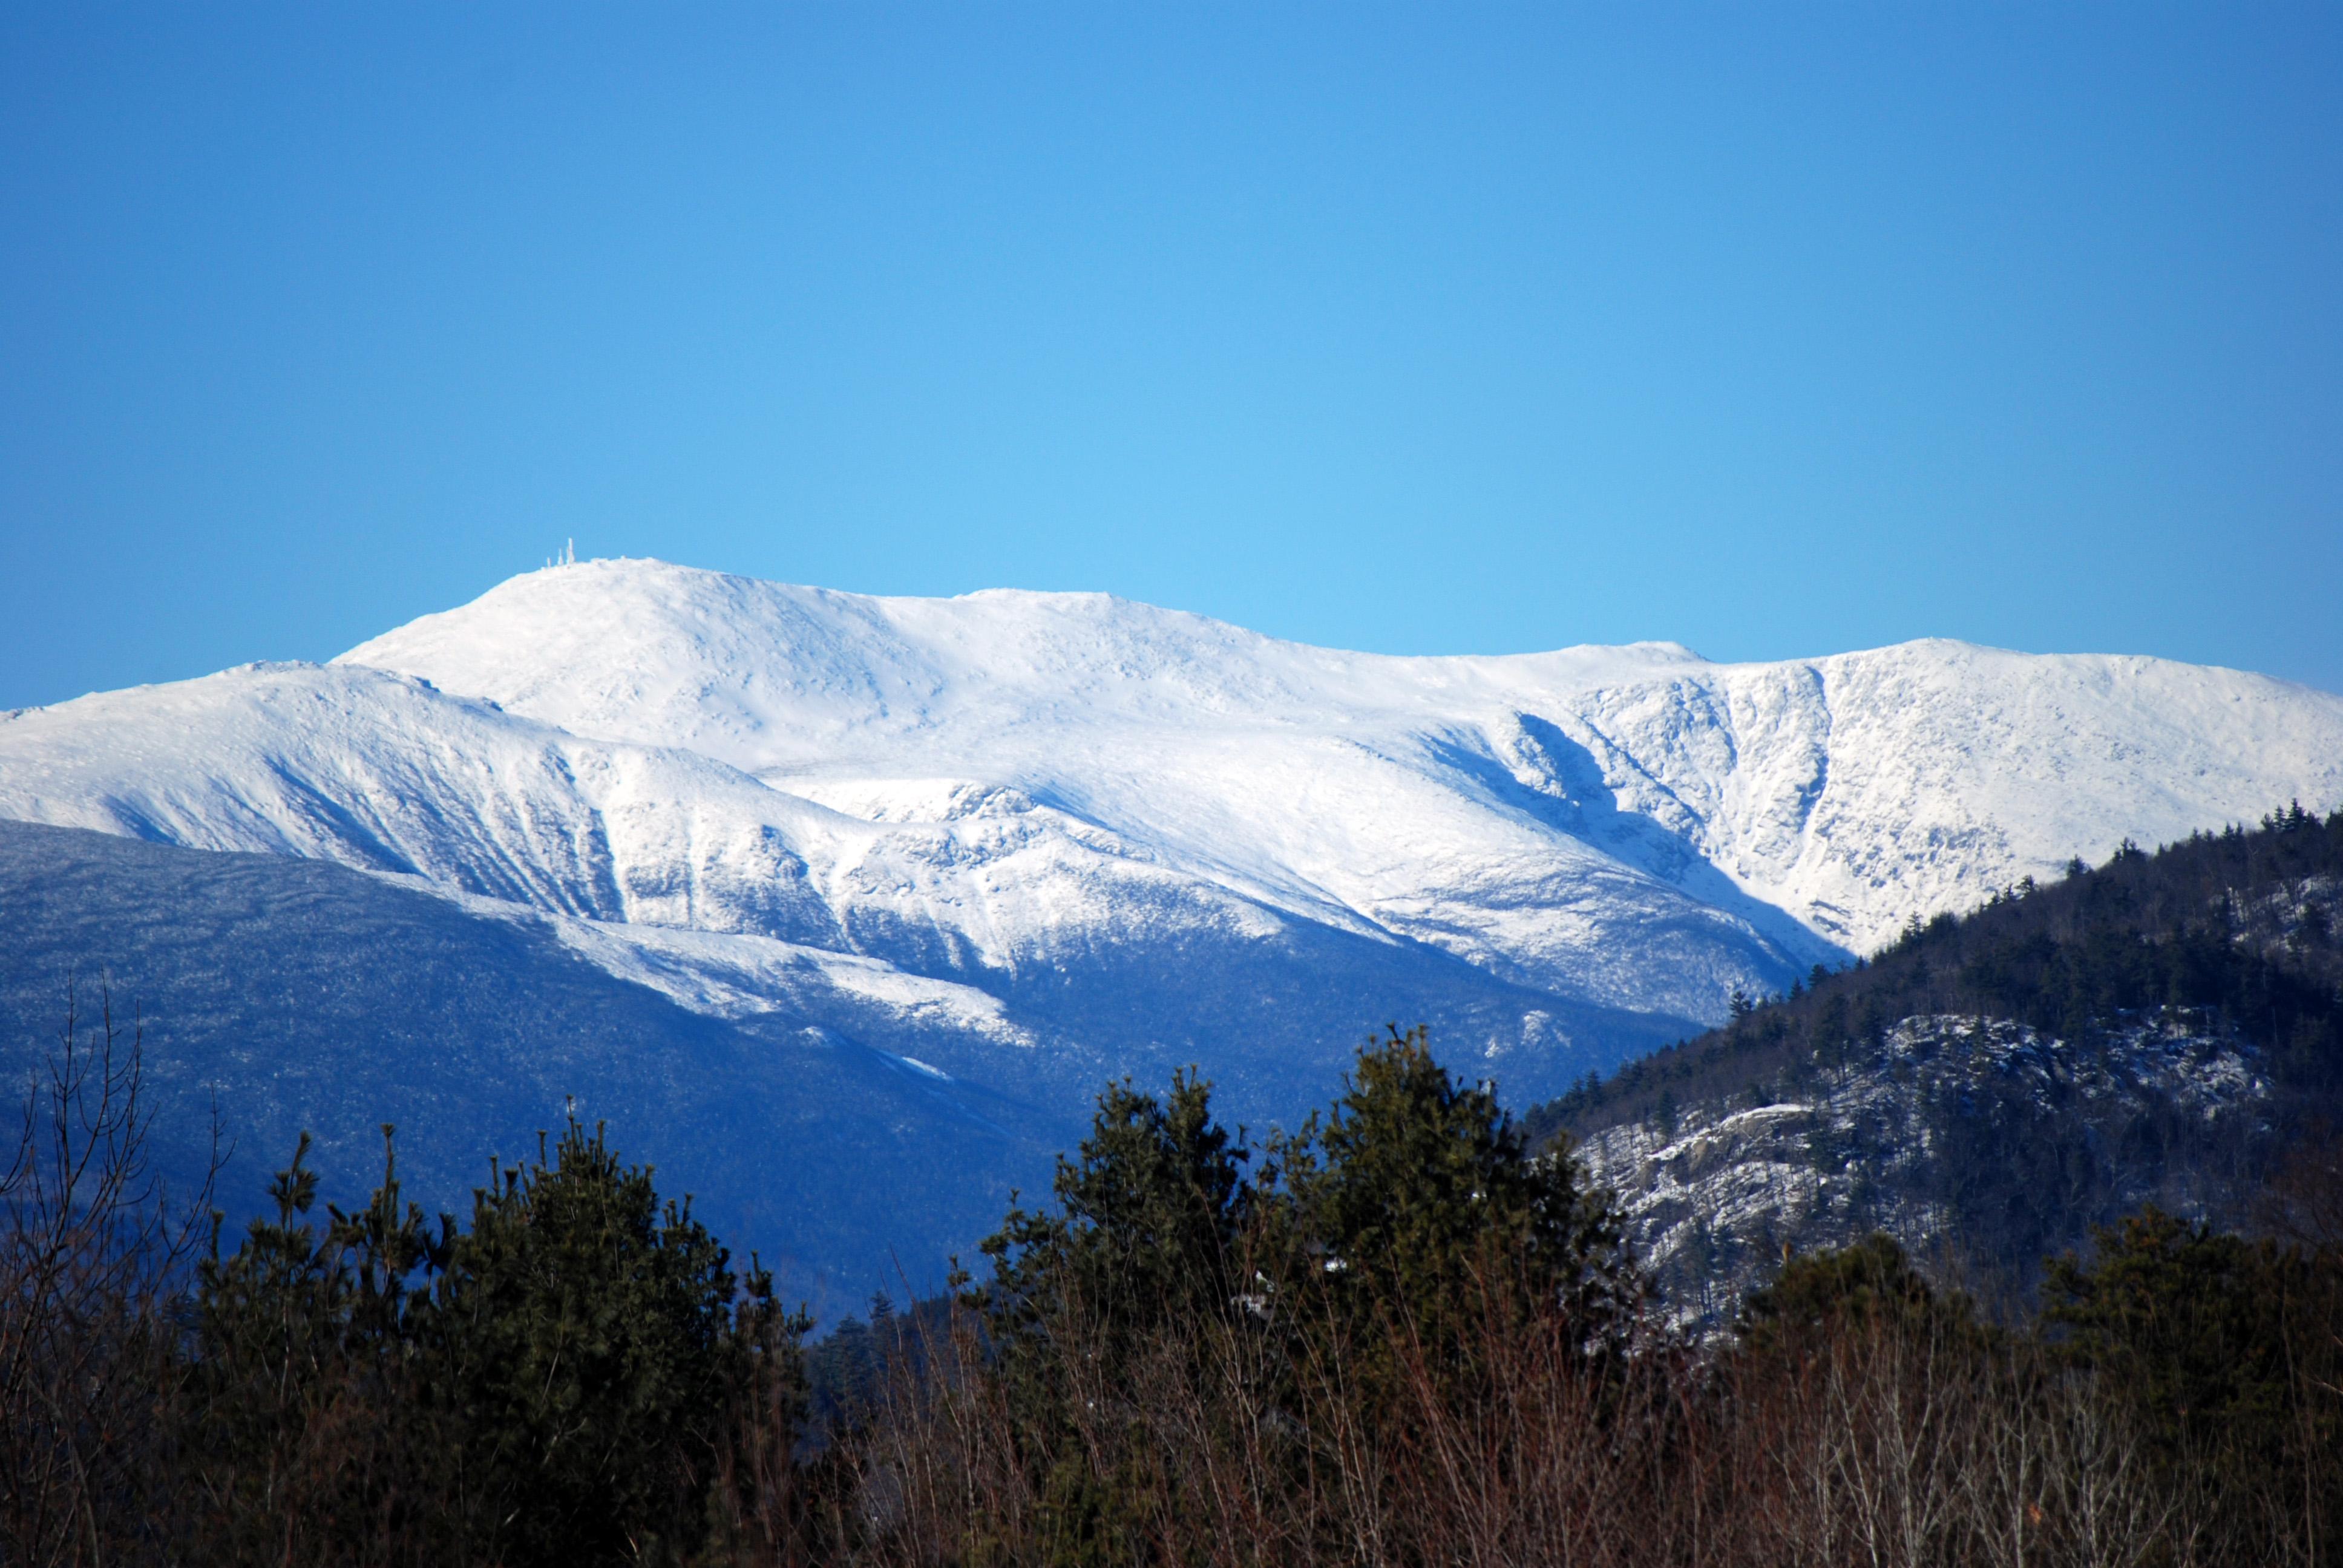 FileWhite Mountains 12 30 09 81jpg  Wikimedia Commons